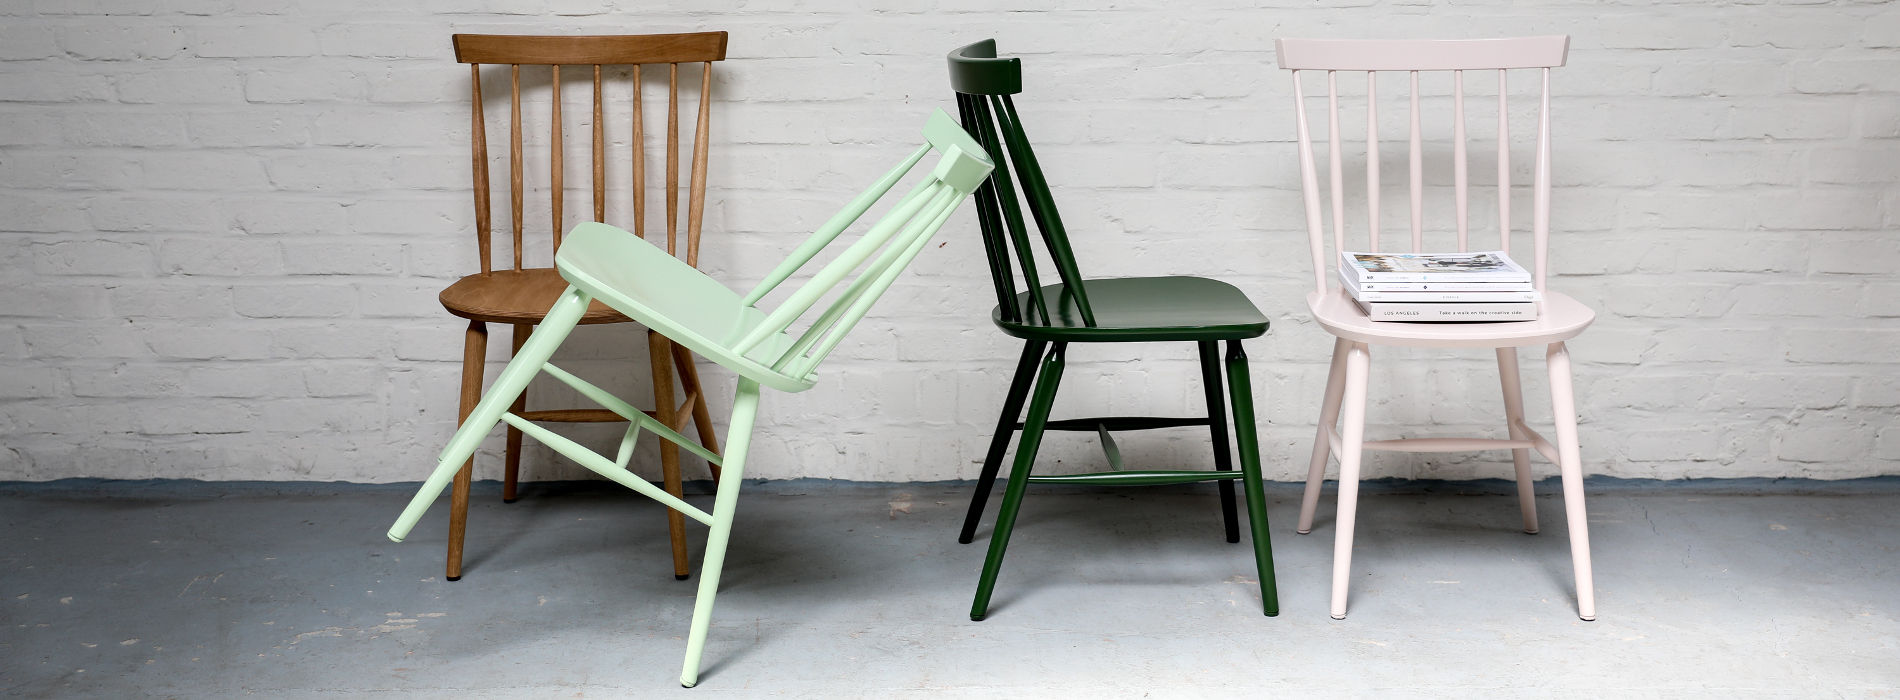 Chaise scandinave Landmade